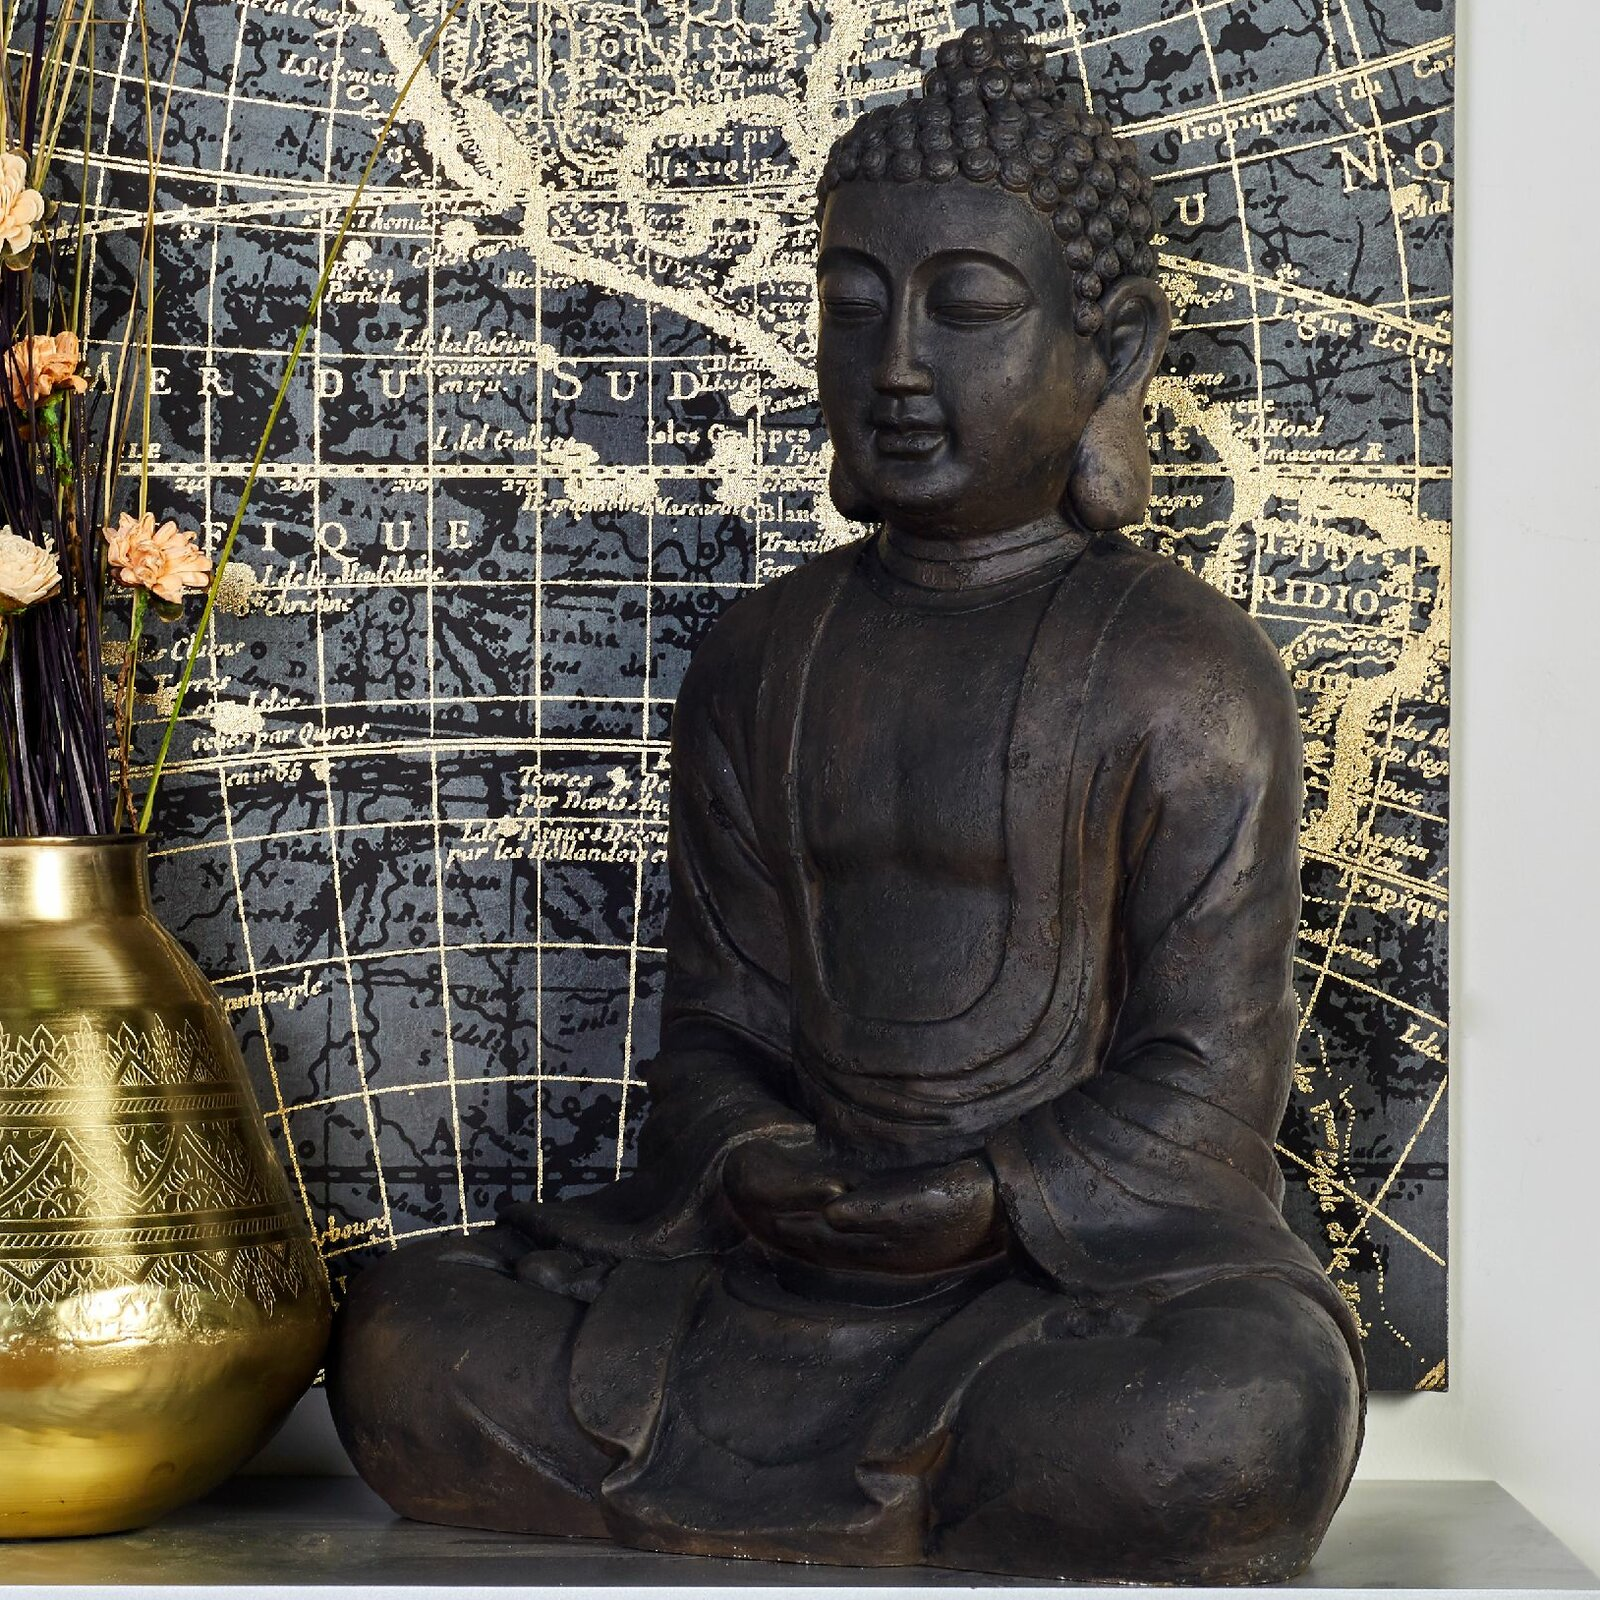 large-buddha-statue-for-spiritual-home-interior-inspiring-polystone-sculpture-dark-black-finish-modern-meditation-corner-ideas